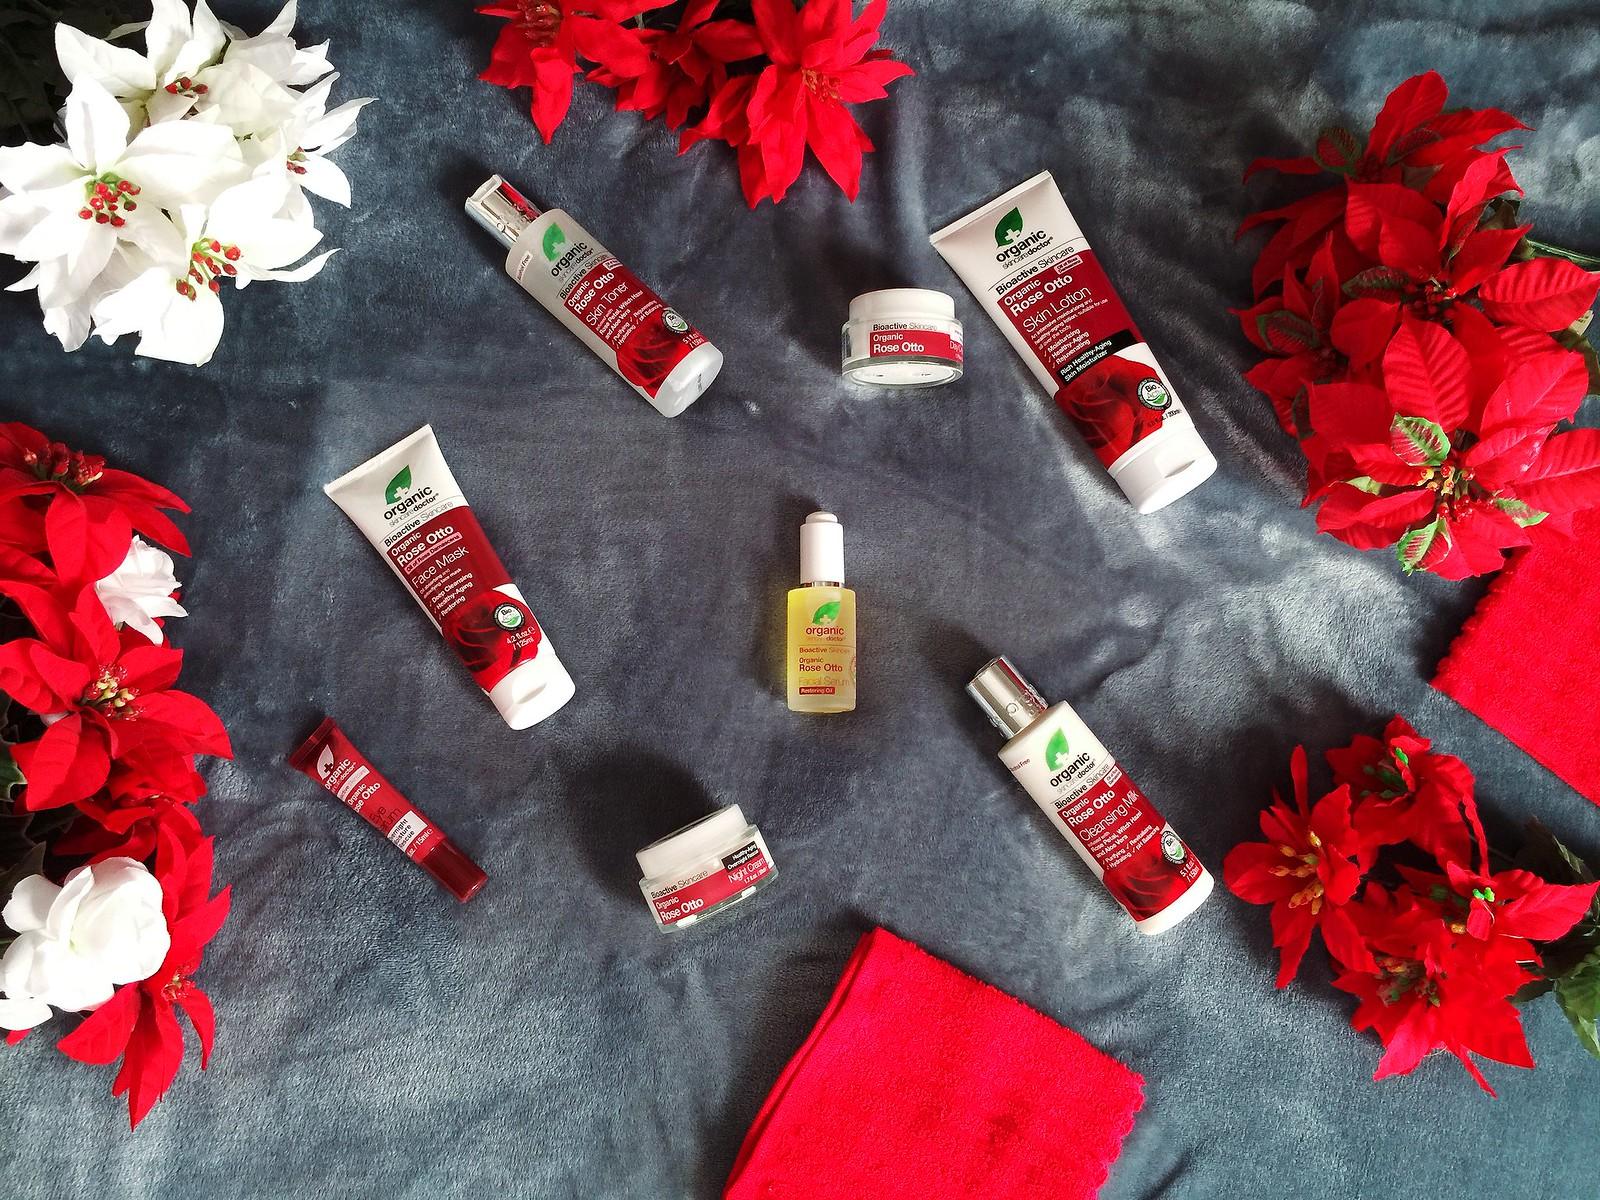 dr. organic rose otto oil skincare